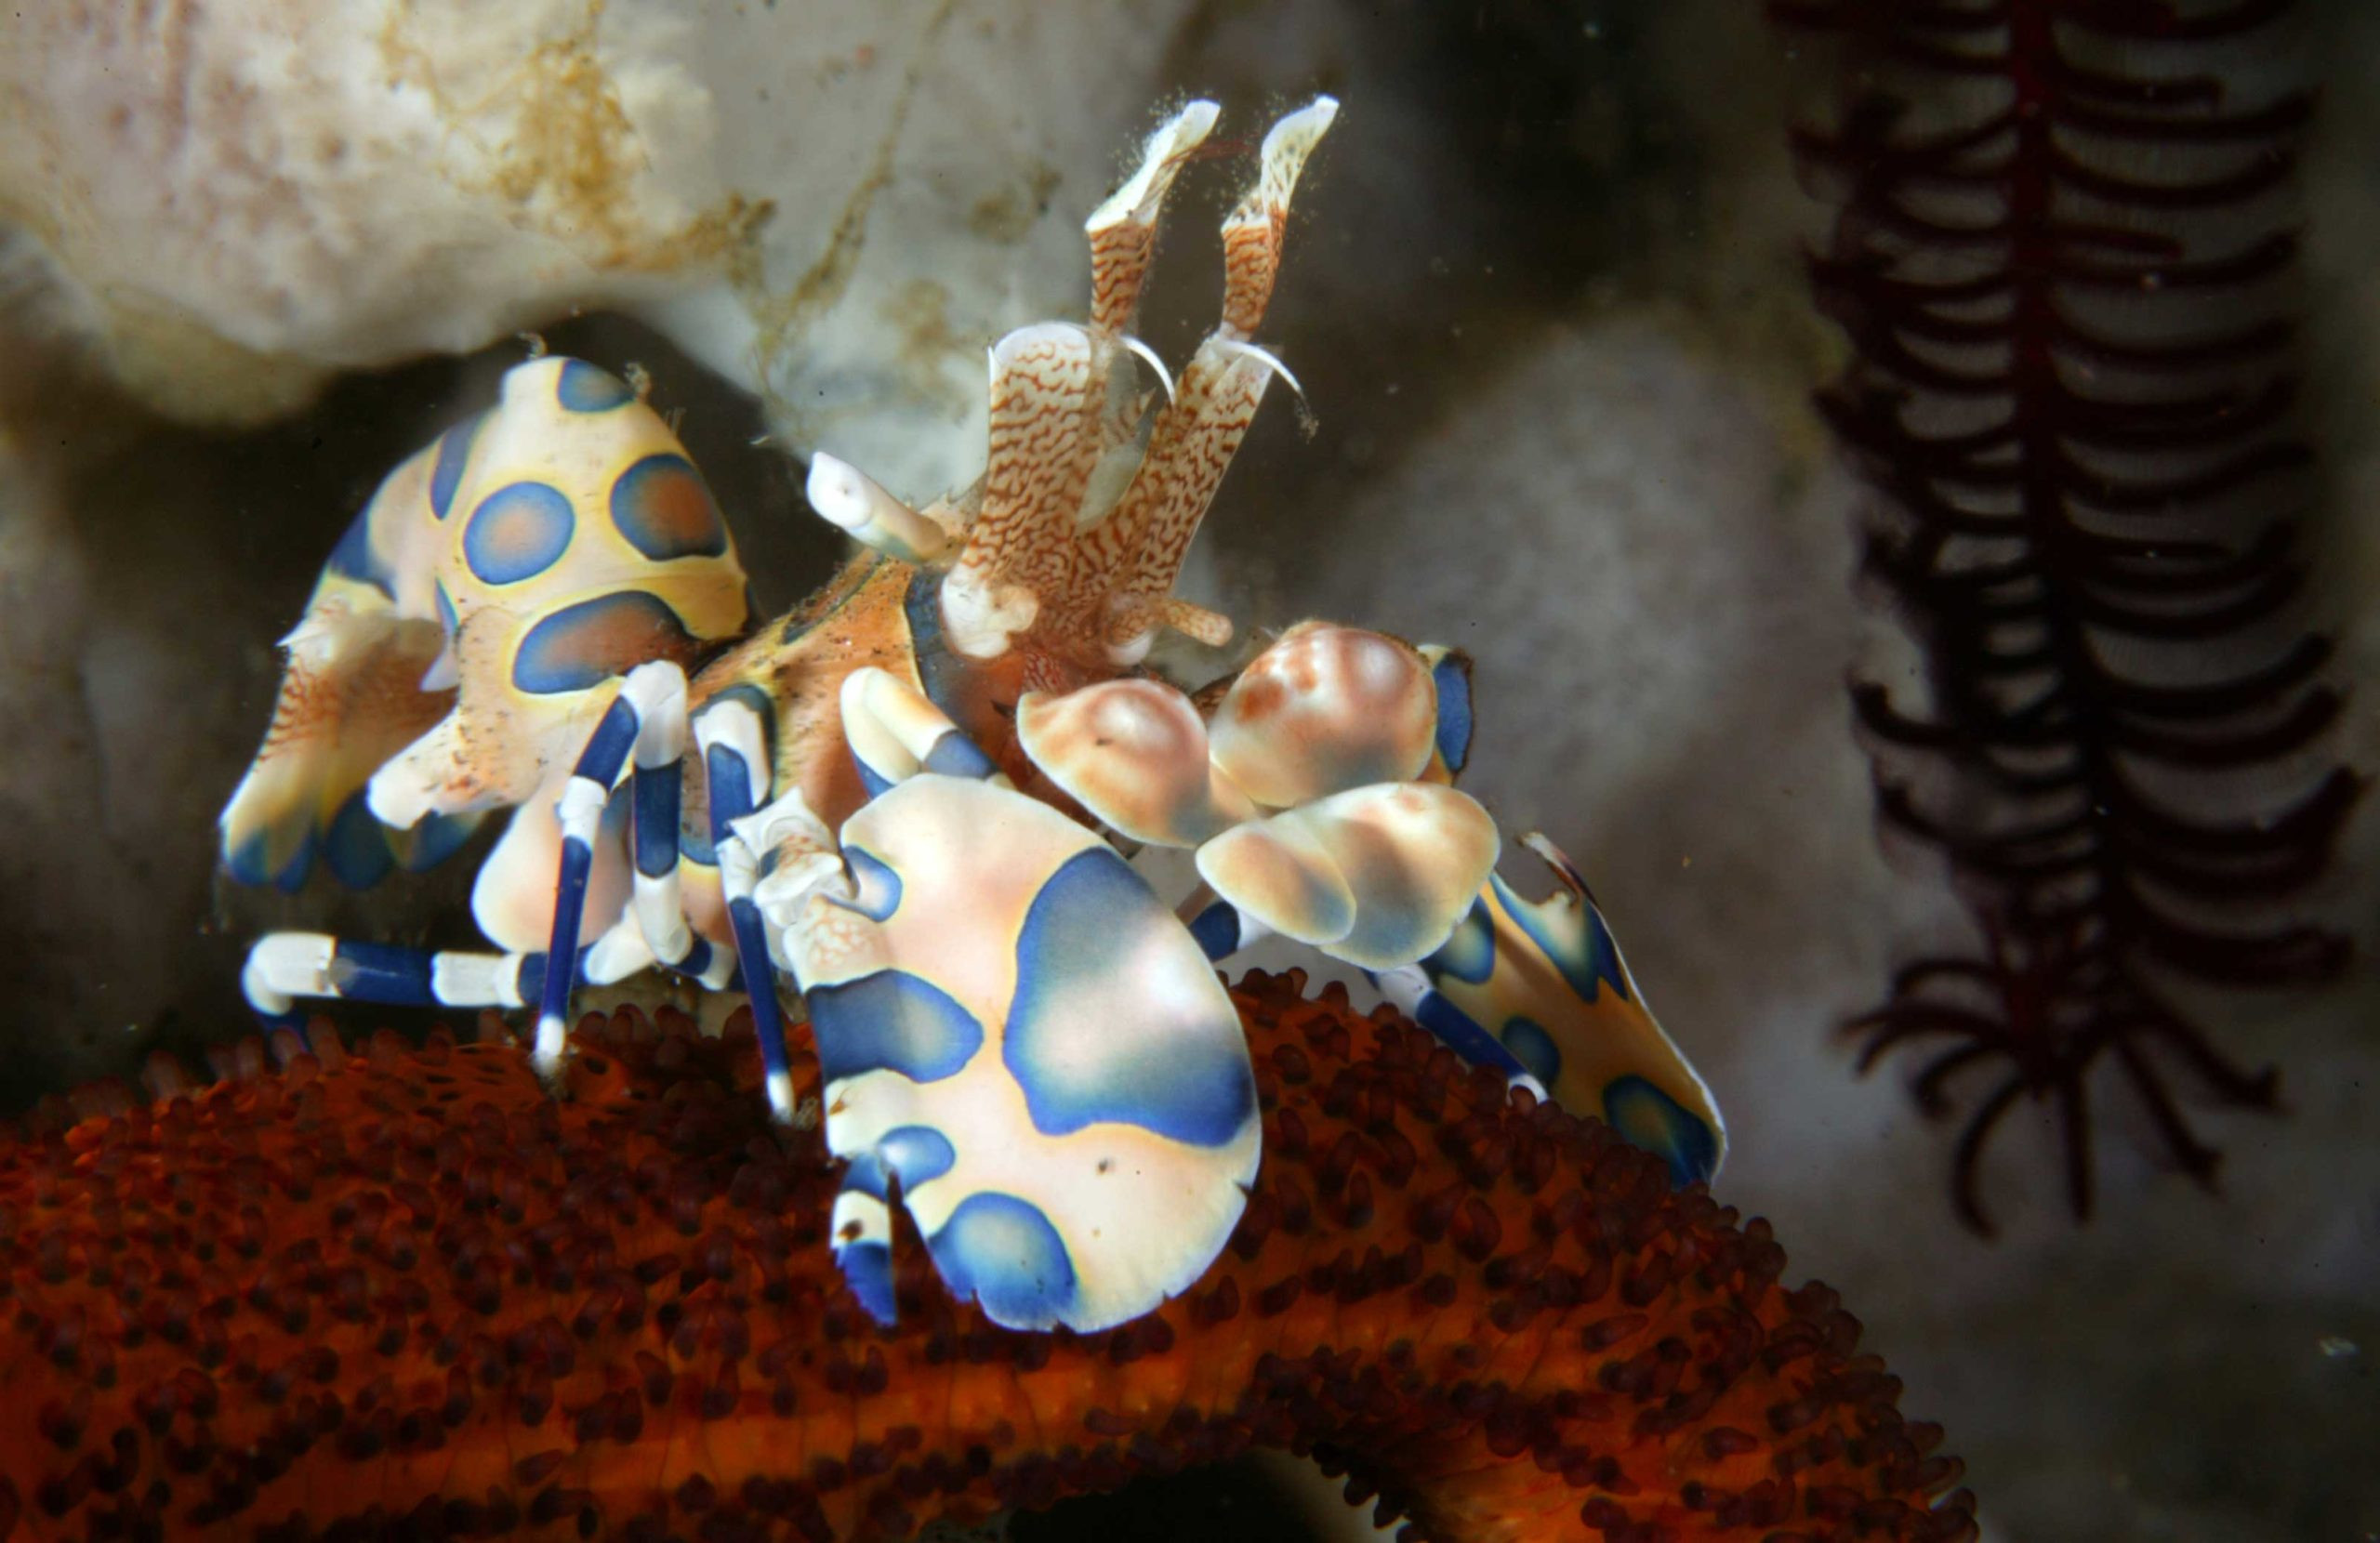 Blue Season Bali - Scuba Diving in Bali